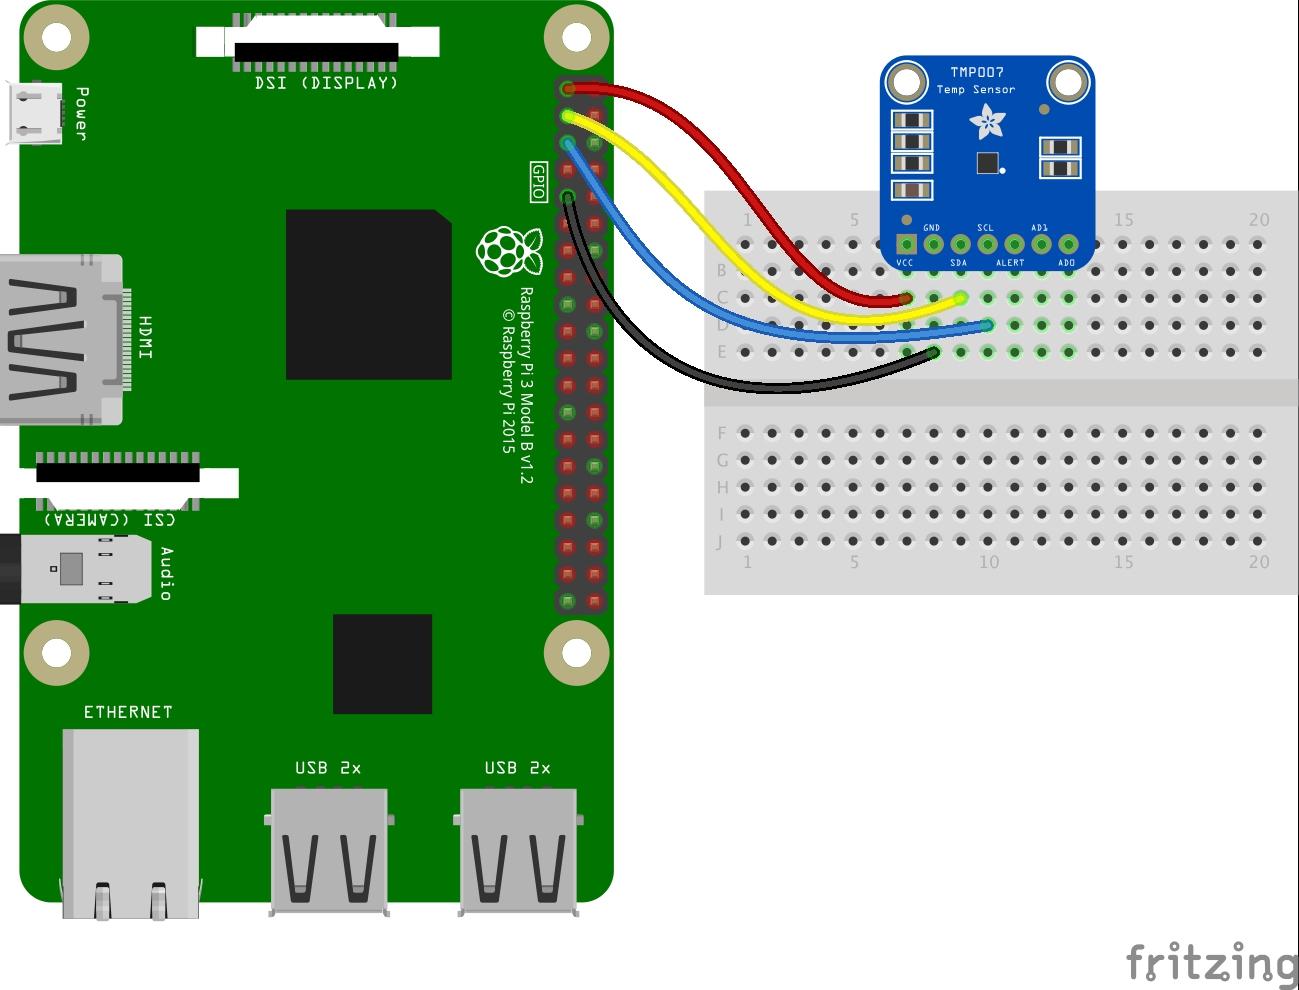 sensors_raspi_tmp007_i2c_bb.jpg